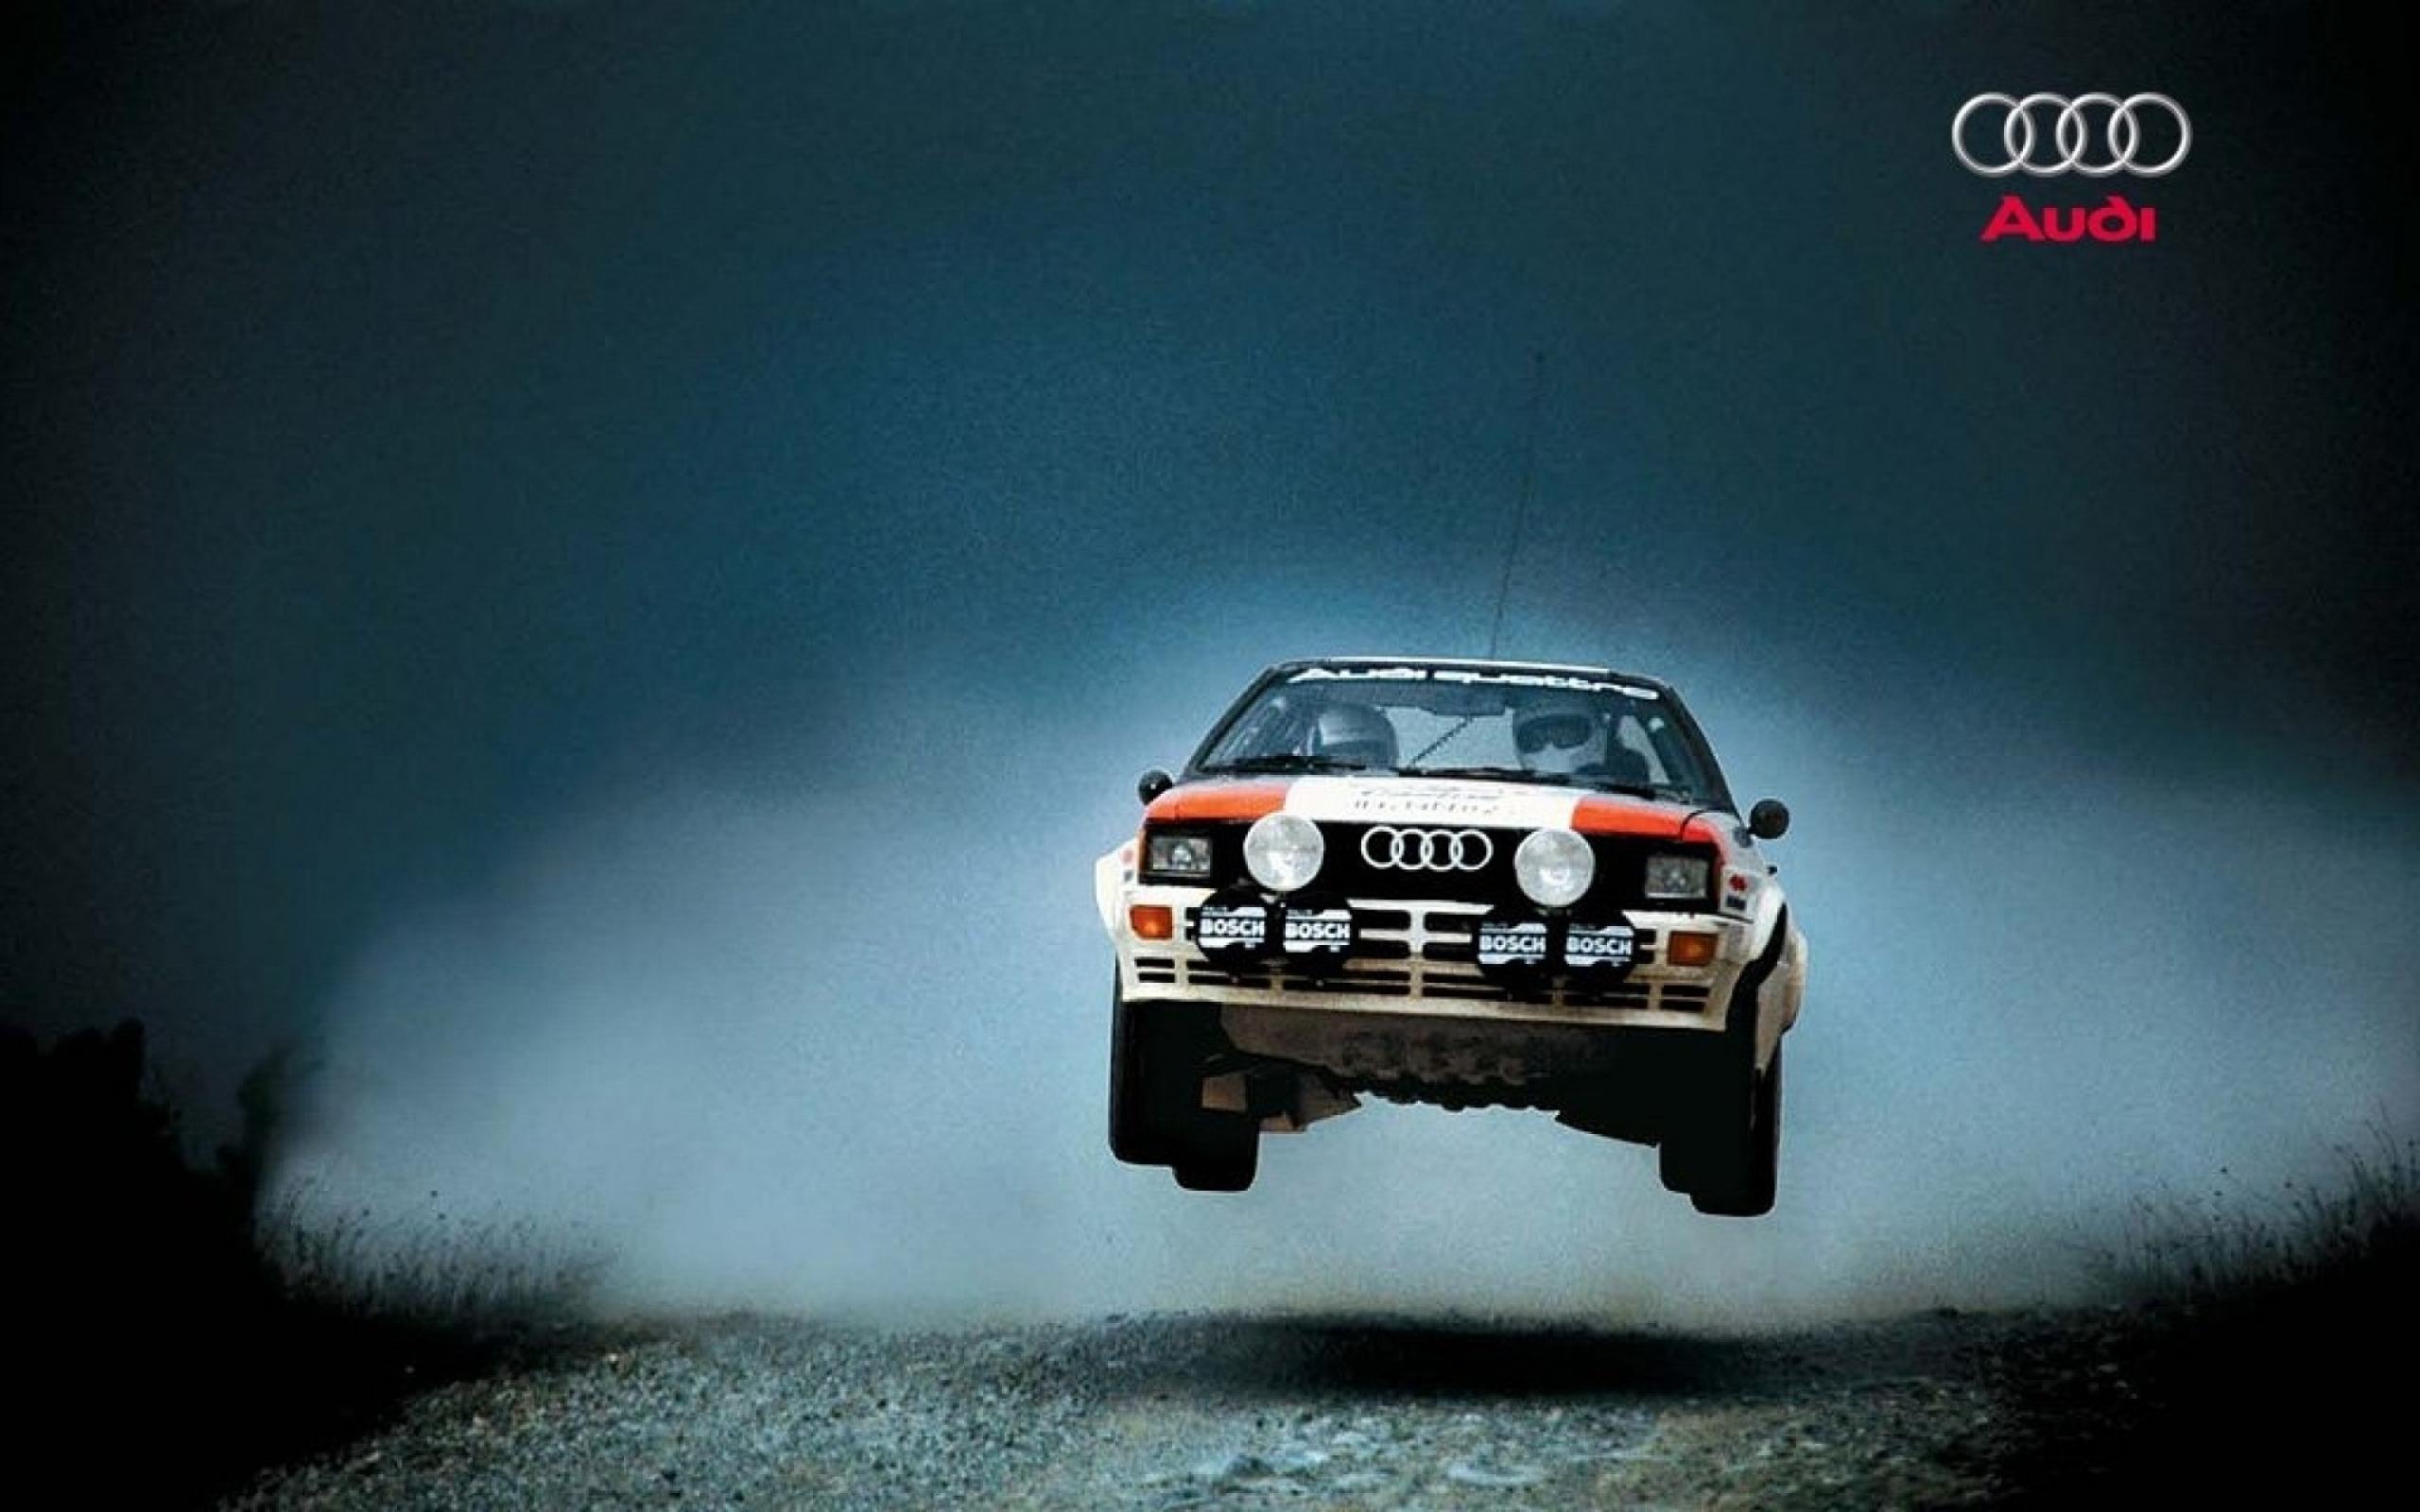 rally audi quattro rally cars group b rally 1920x1200 wallpaper 2560x1600